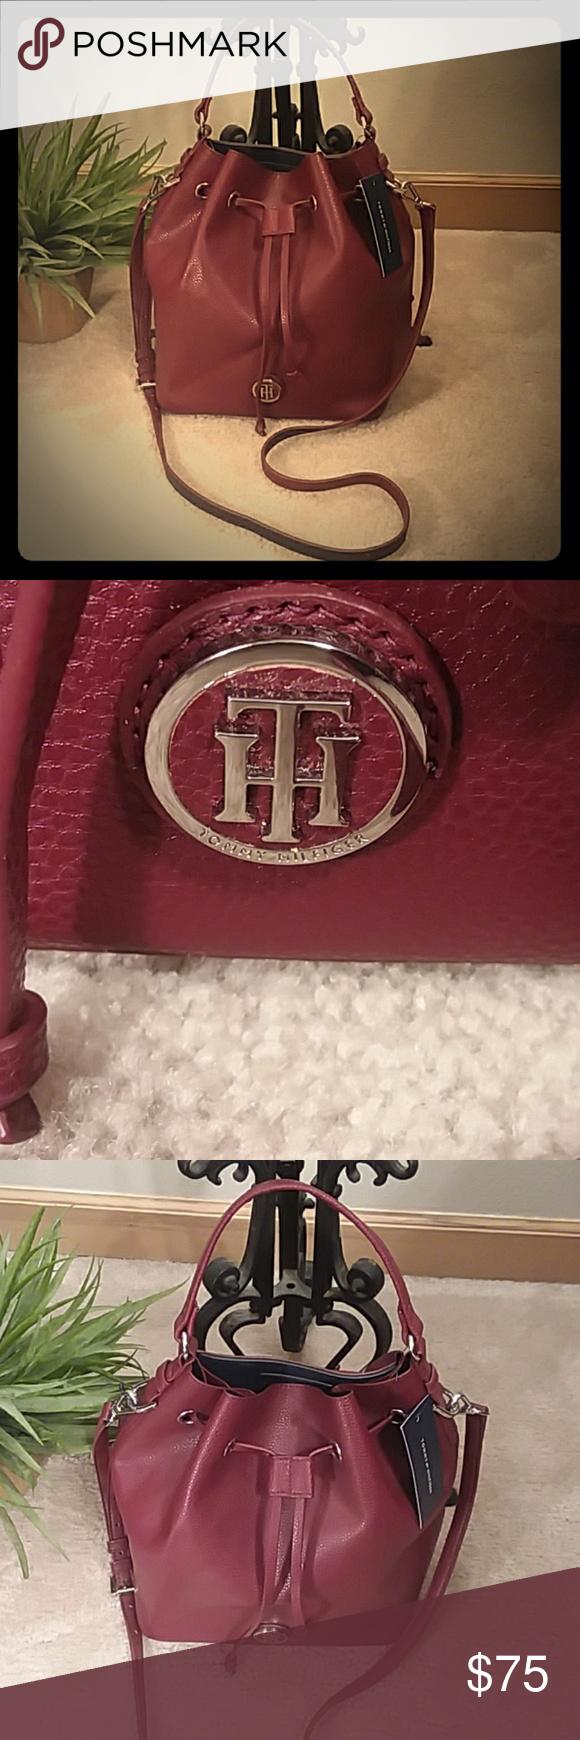 fe091a716 TOMMY HILFIGER Brand new with tags Tommy Hilfiger Mara drawstring ...